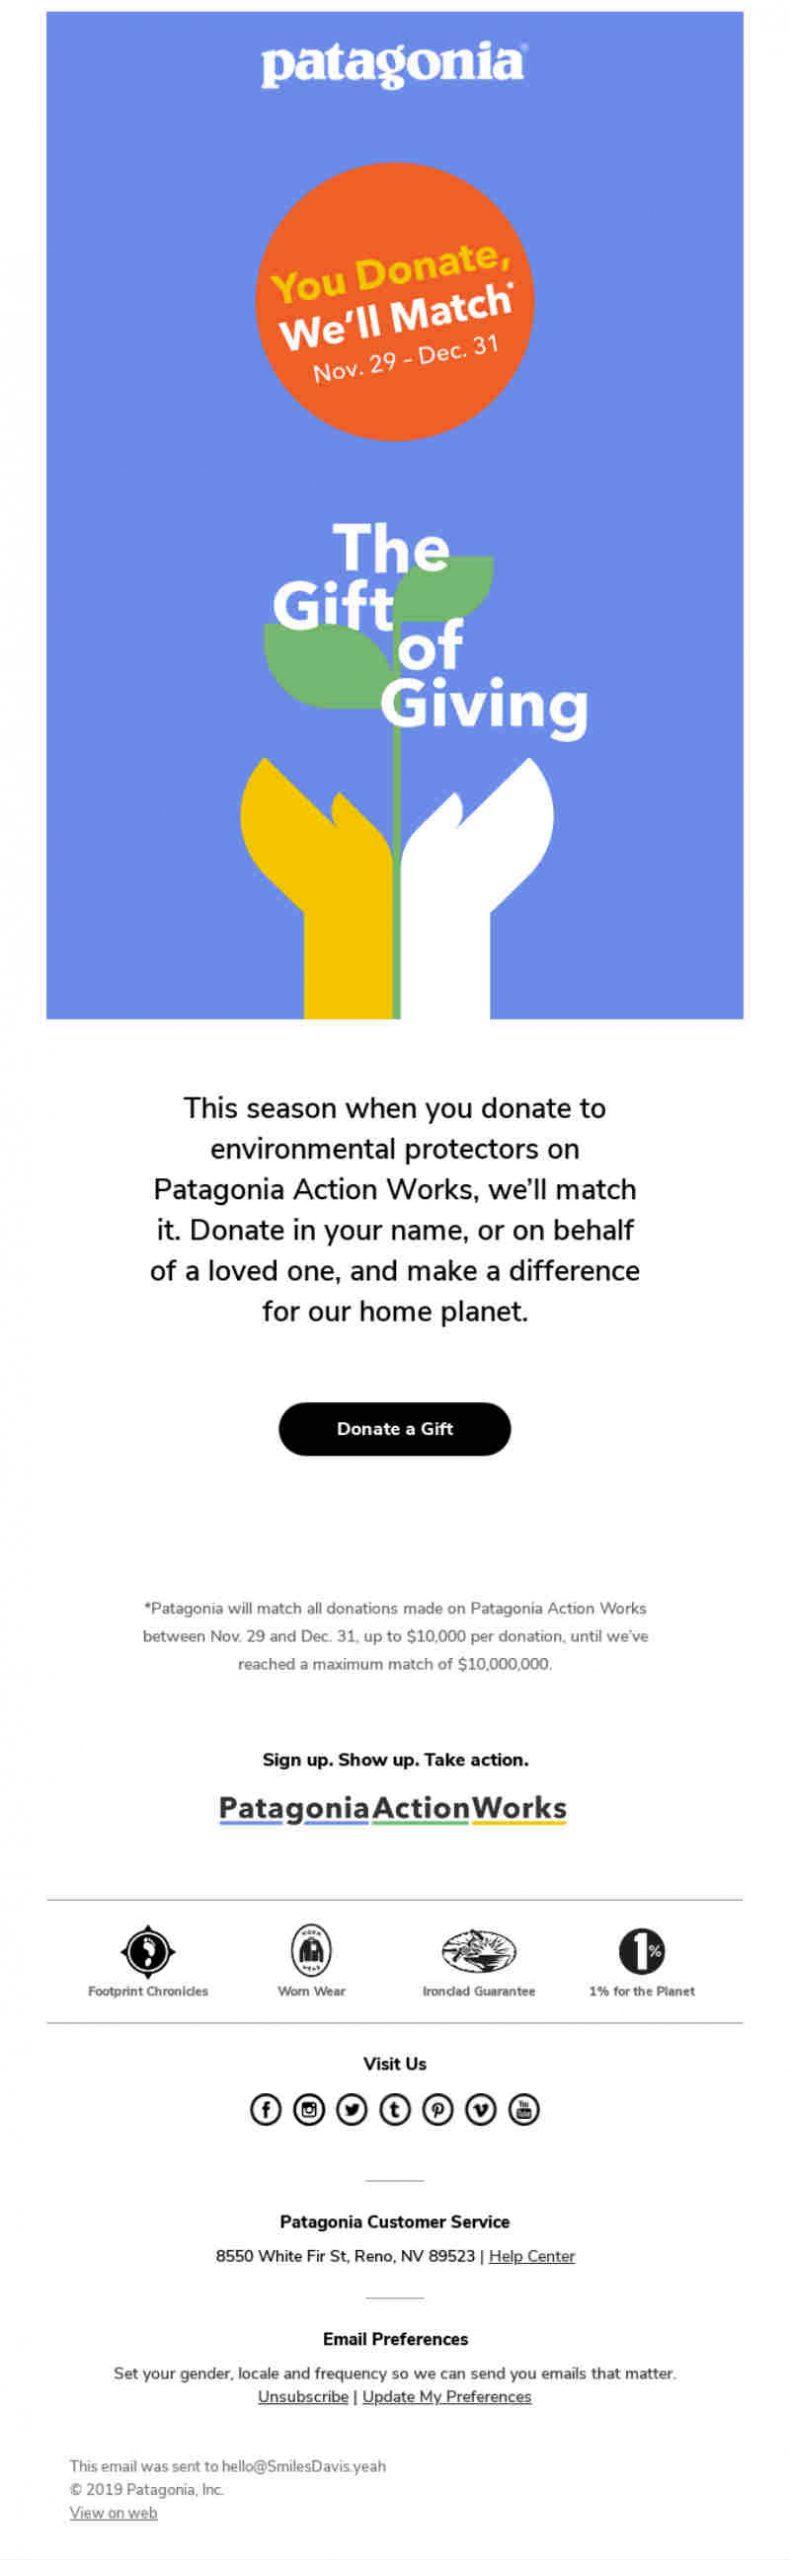 patagonia newsletter